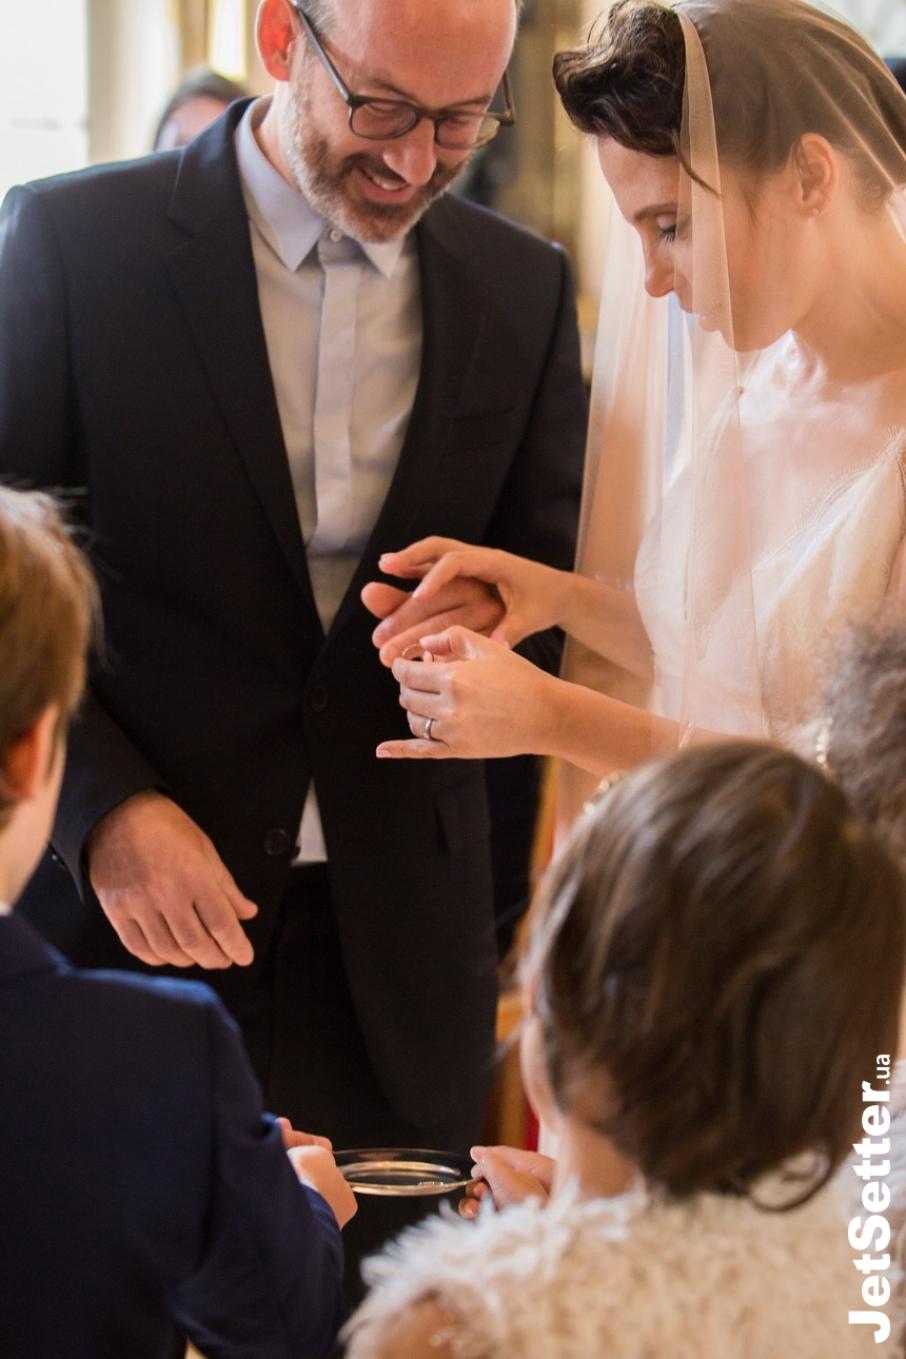 Українська письменниця і співачка, Ірена Карпа вийшла заміж за француза Людовіка-Кирила Требюше. Фото: jetsetter.ua